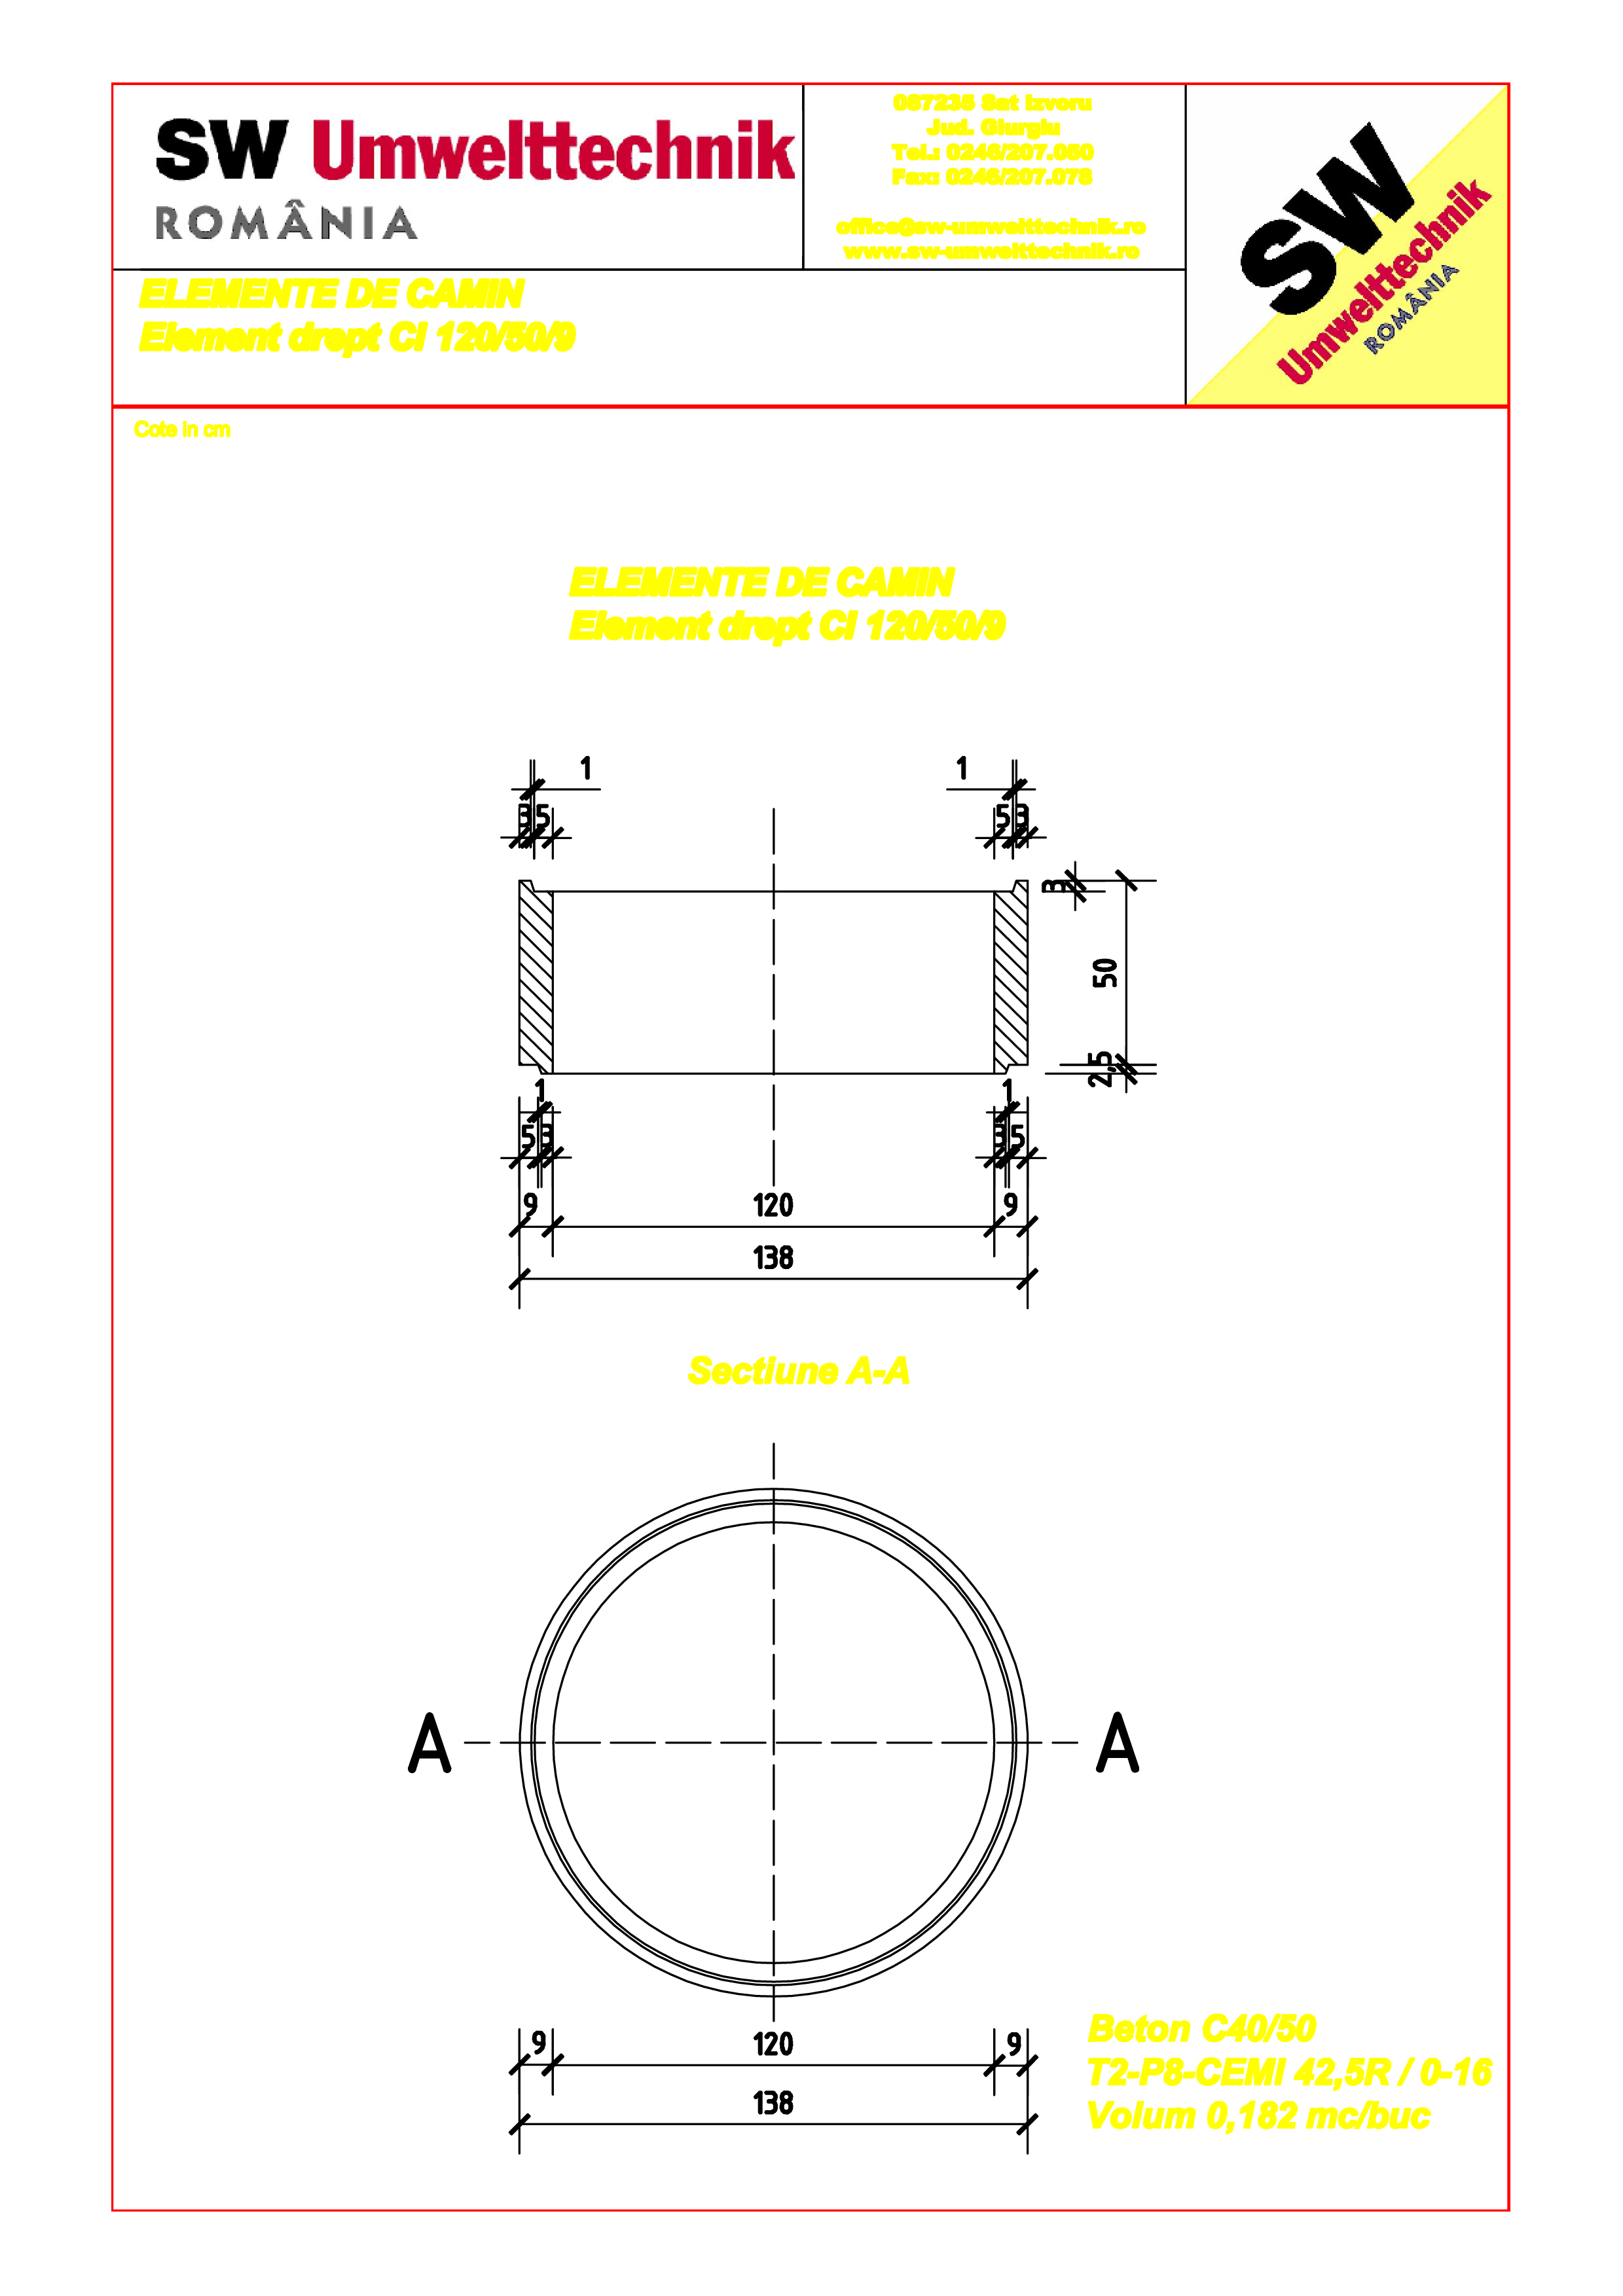 Pagina 1 - CAD-PDF Element drept - inel DN120 H50 SW UMWELTTECHNIK Detaliu de produs